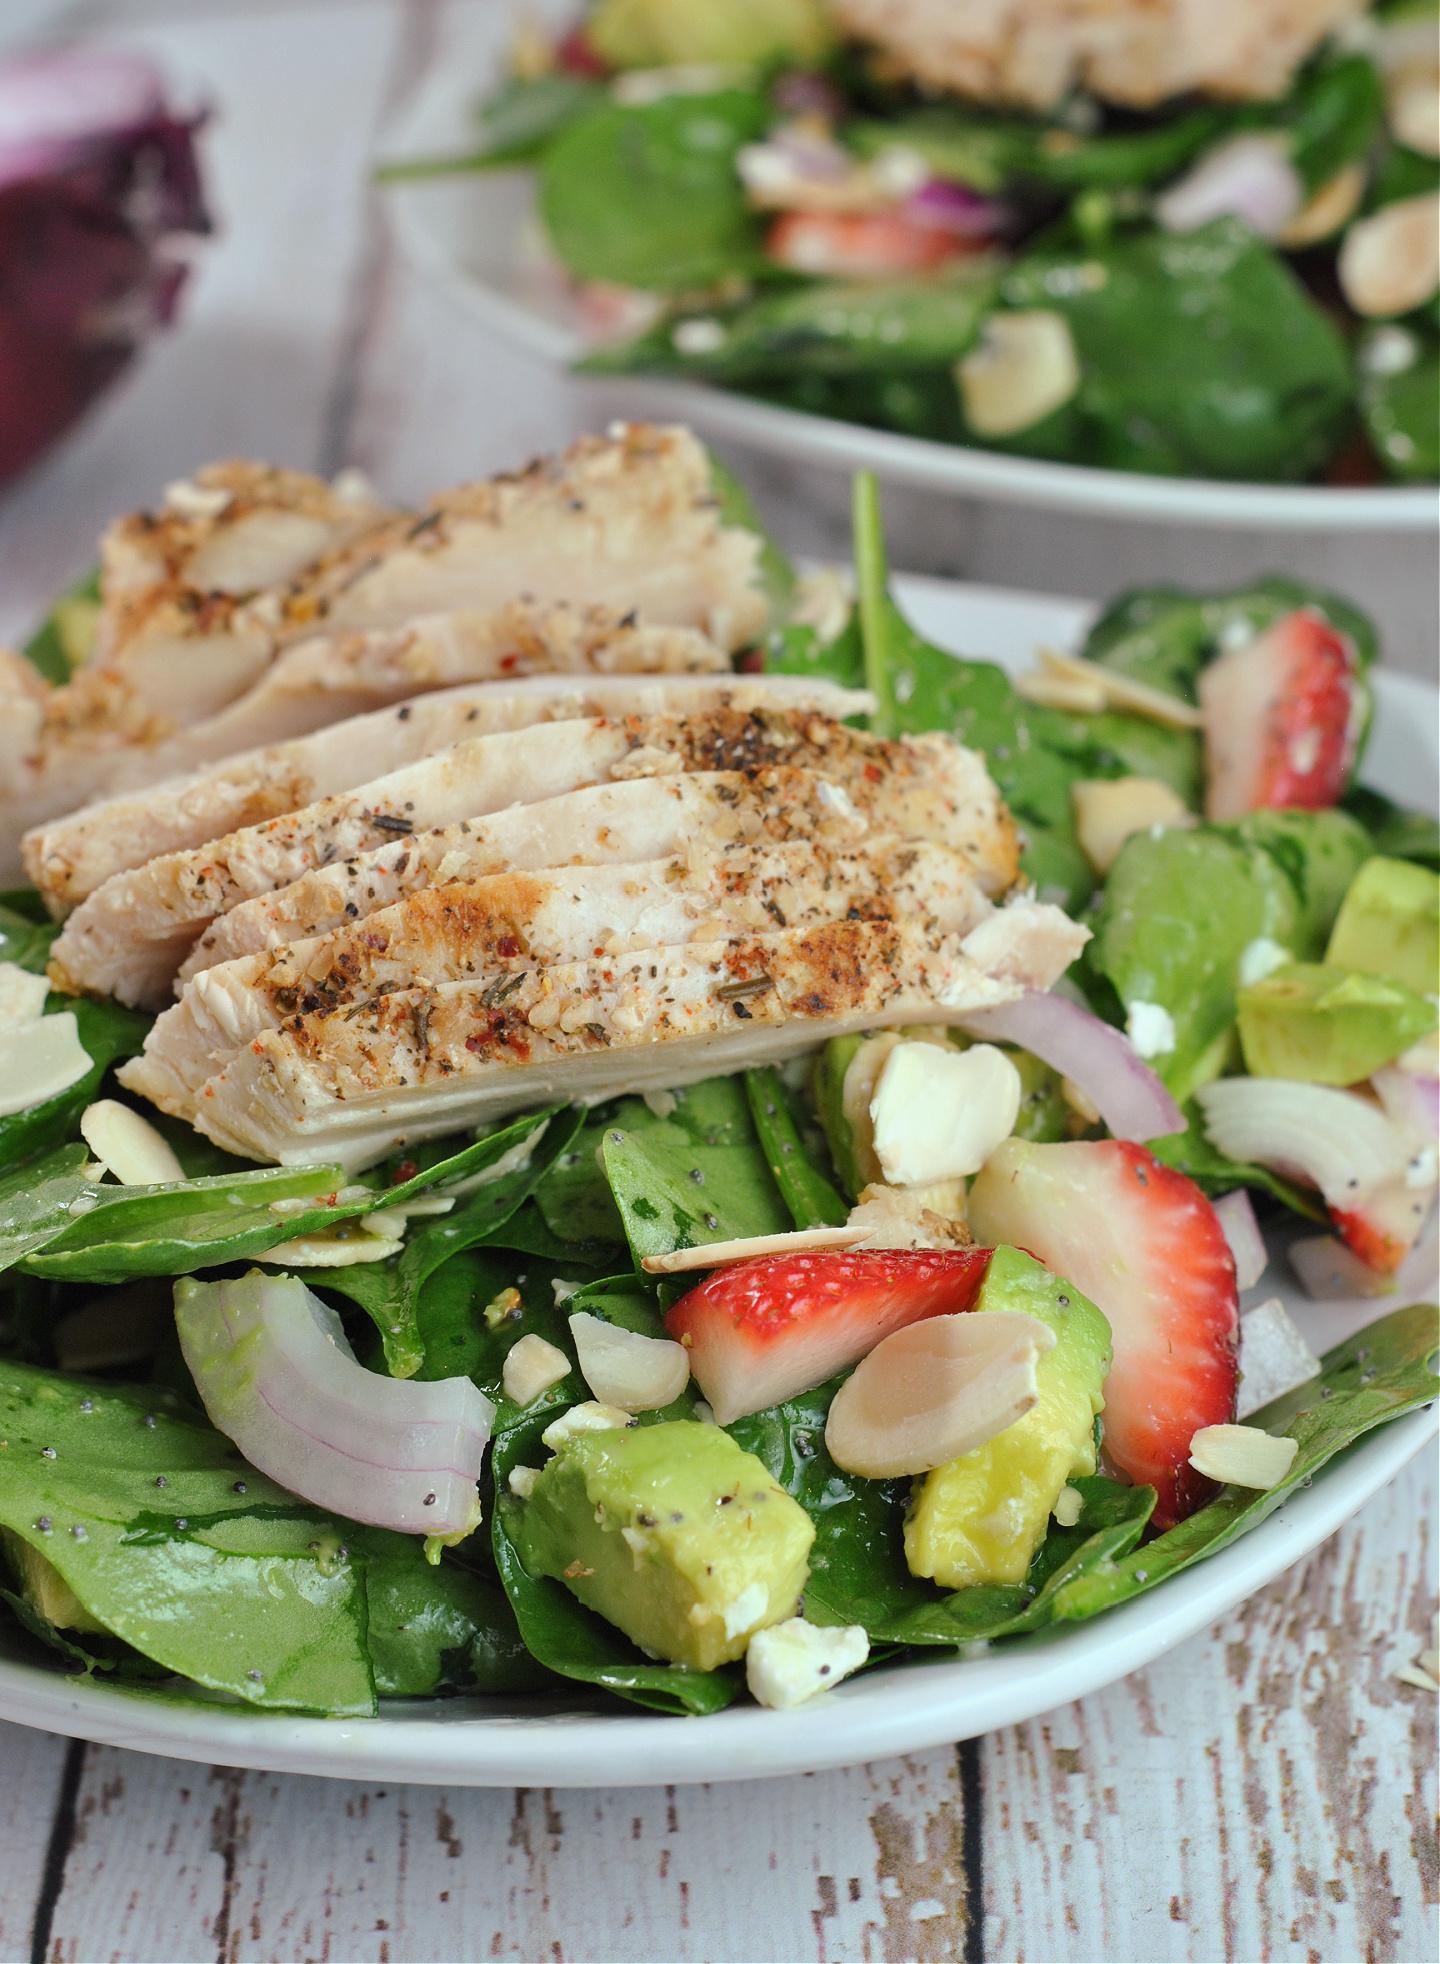 Strawberry-Avocado Chicken and Spinach Salad with Poppyseed Dressing via @preventionrd